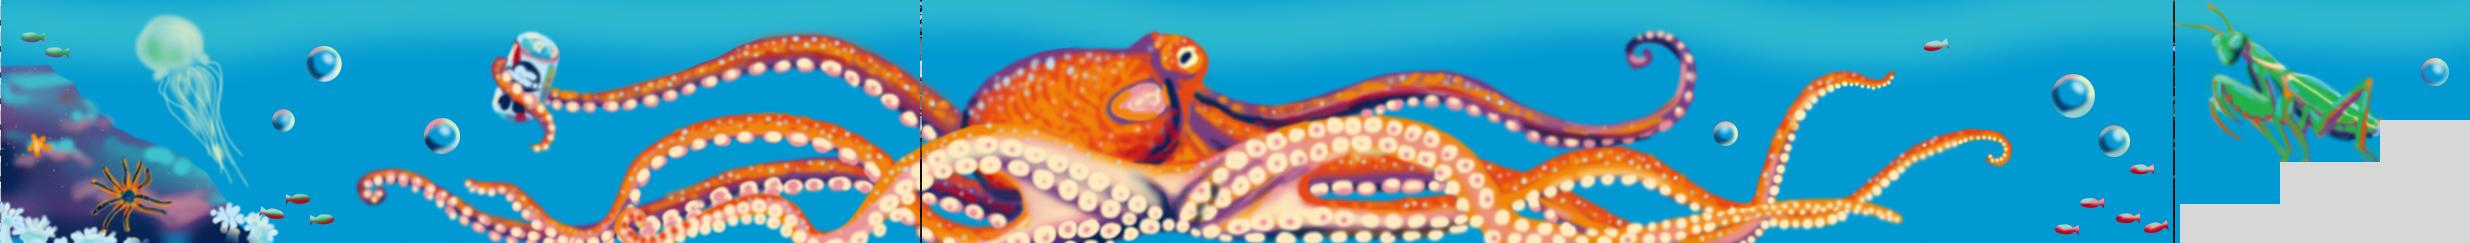 rand-pool-mural-mockup-final